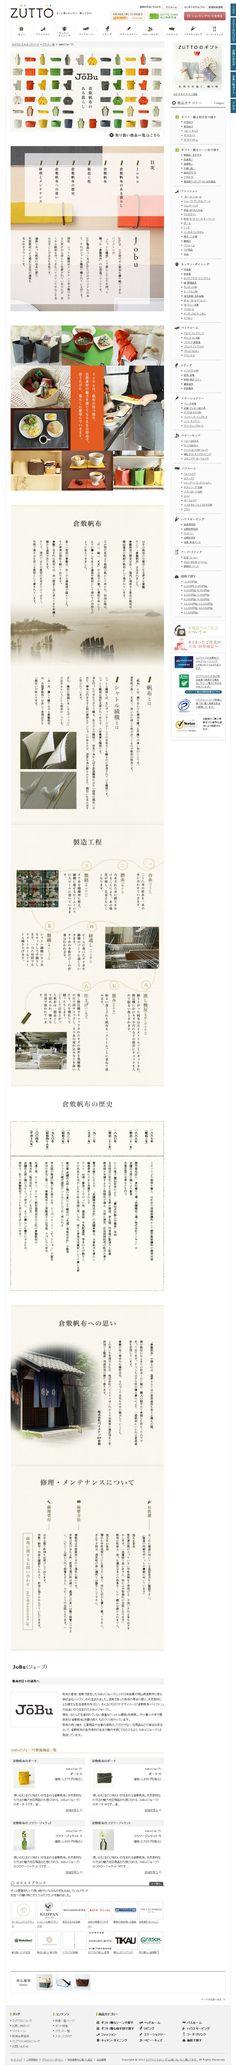 www.zutto.co.jp